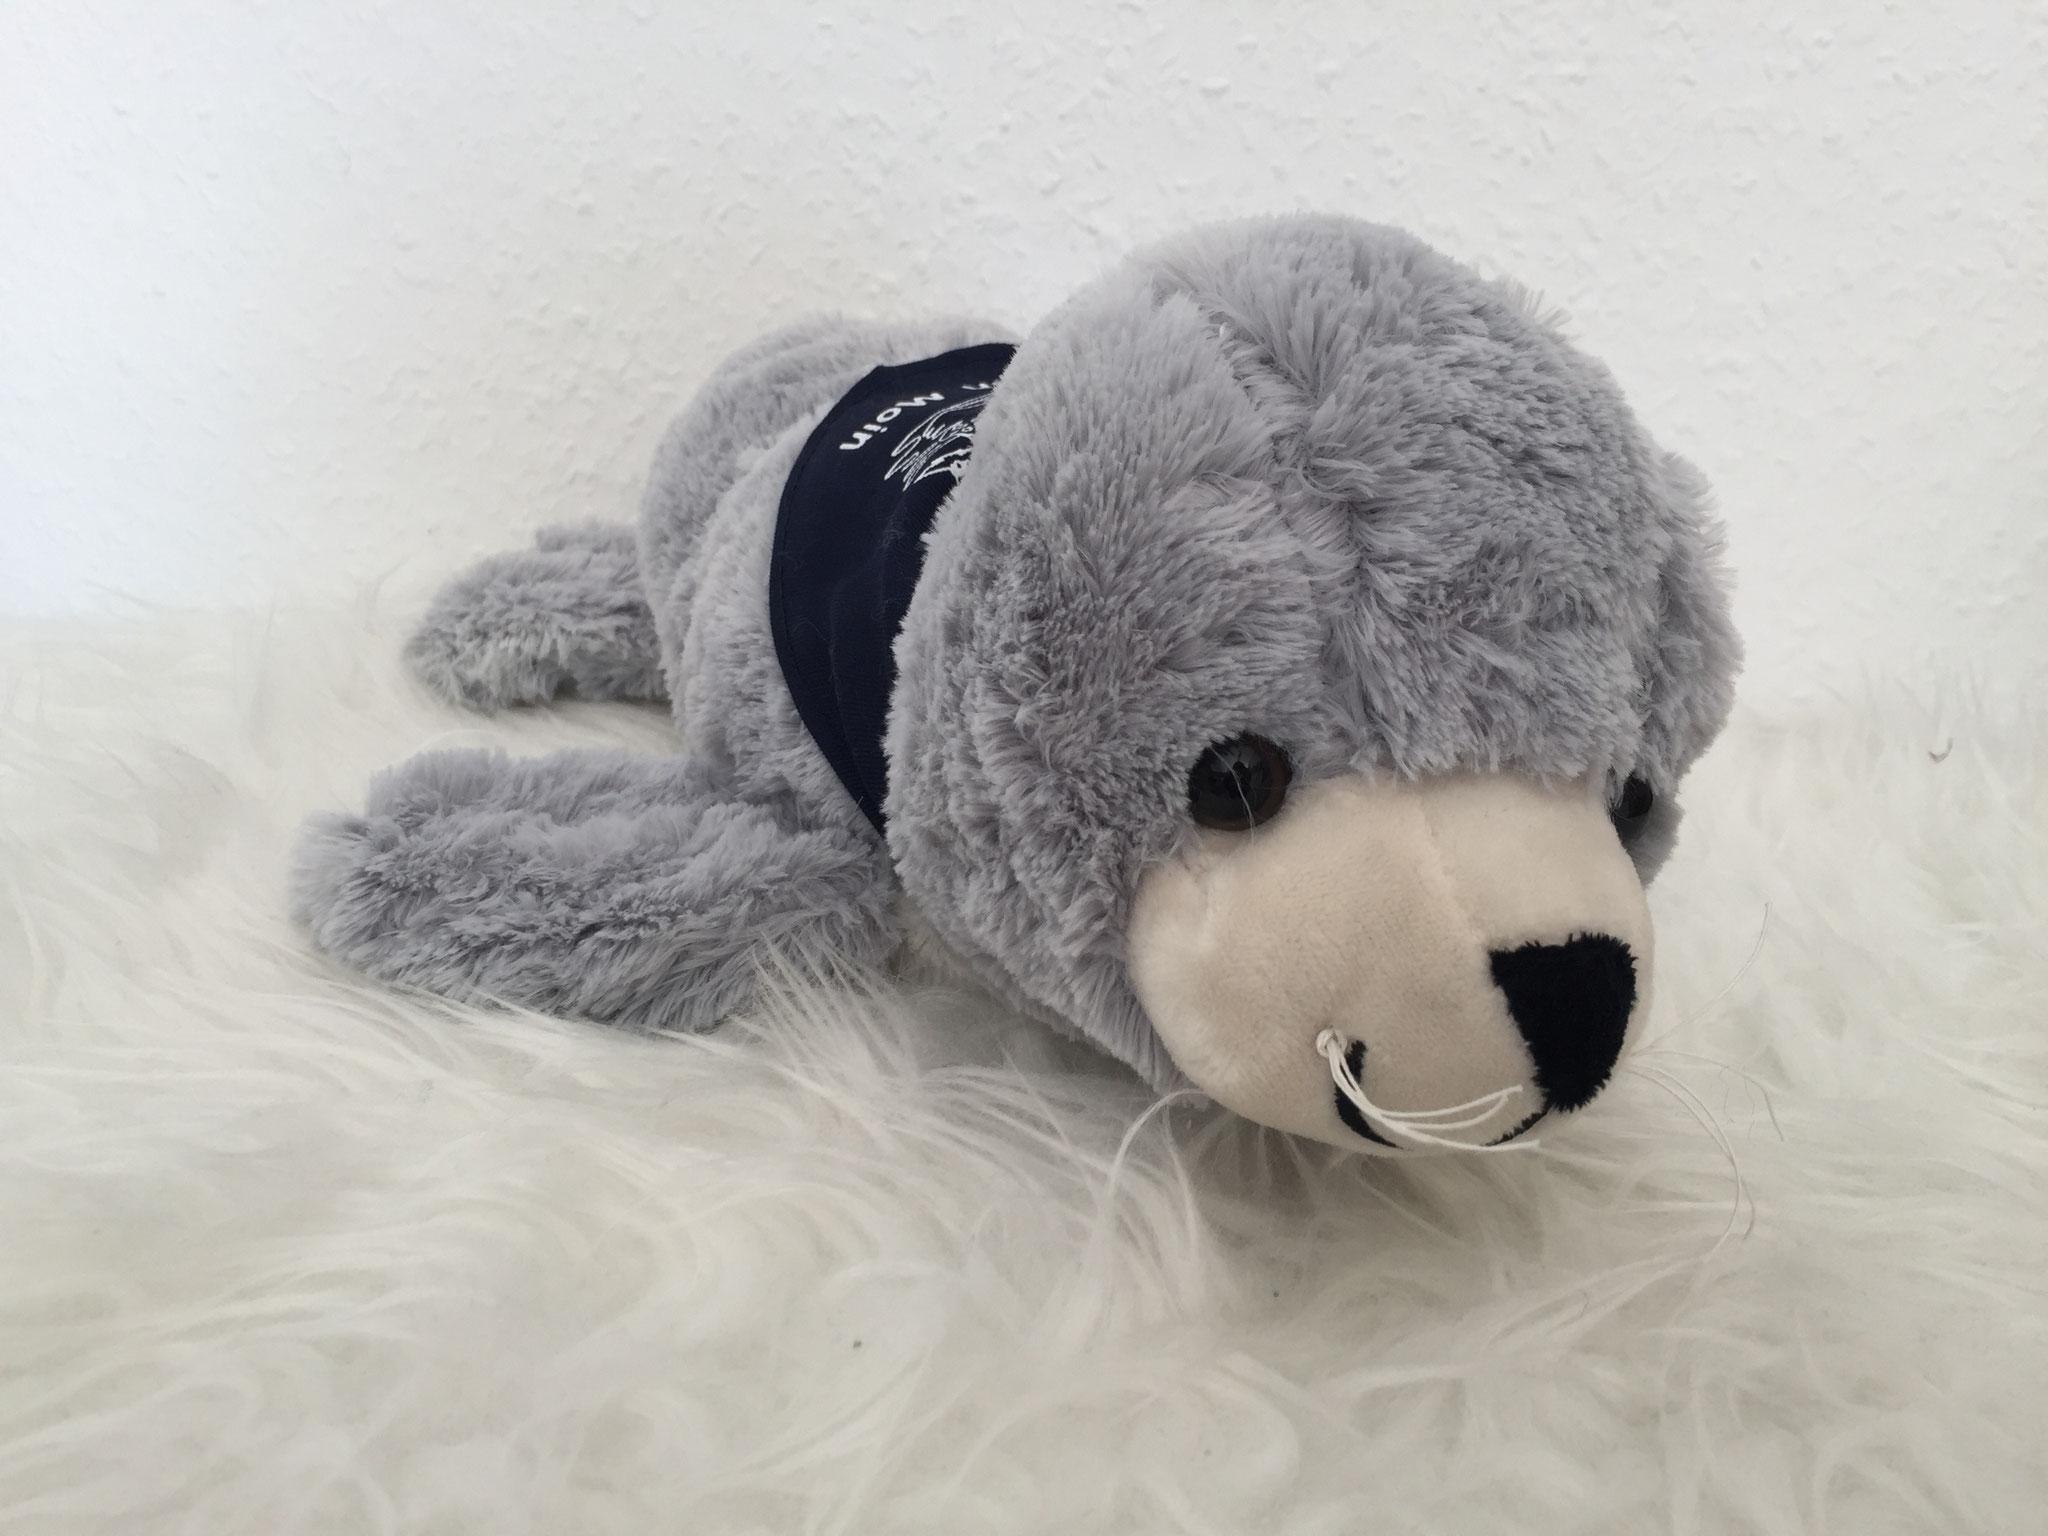 Klasse 2a - Klassenlehrerin Frau Reploh – Klassentier Piet, der Seehund